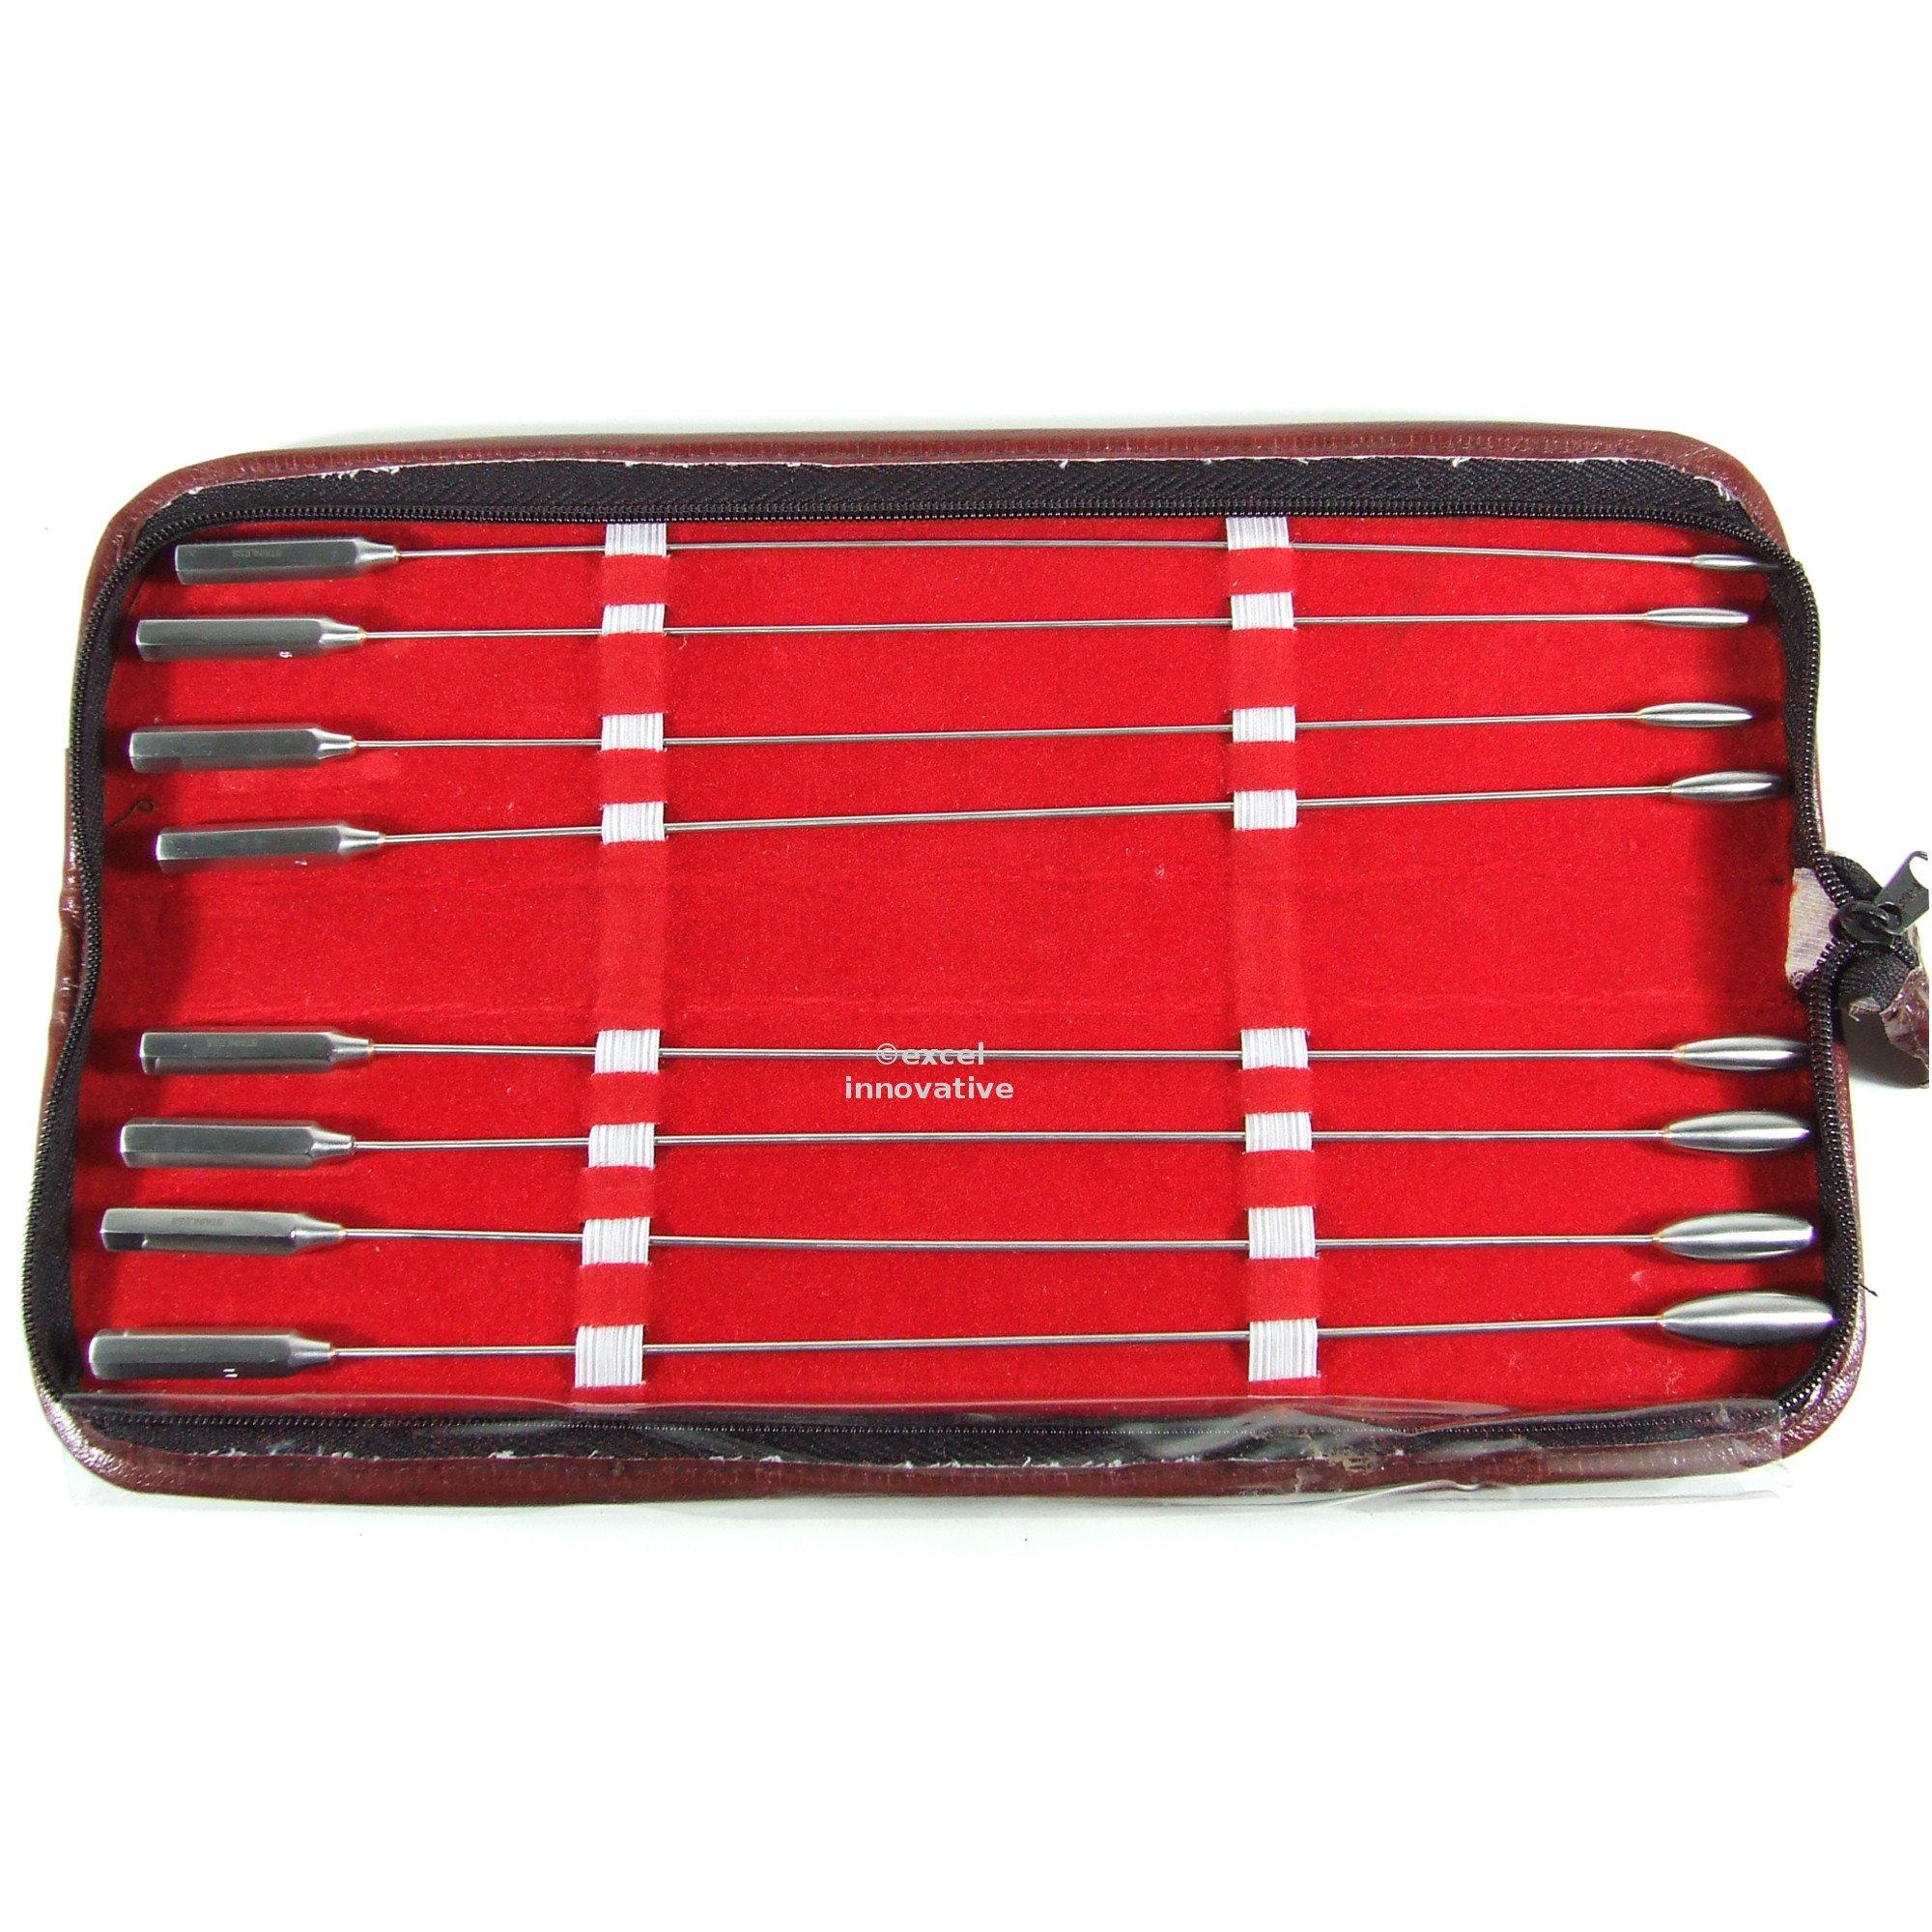 Bakes Dilators 11.75'' Long Malleable Shafts Set of 8 Sizes in a Case | Medixplus